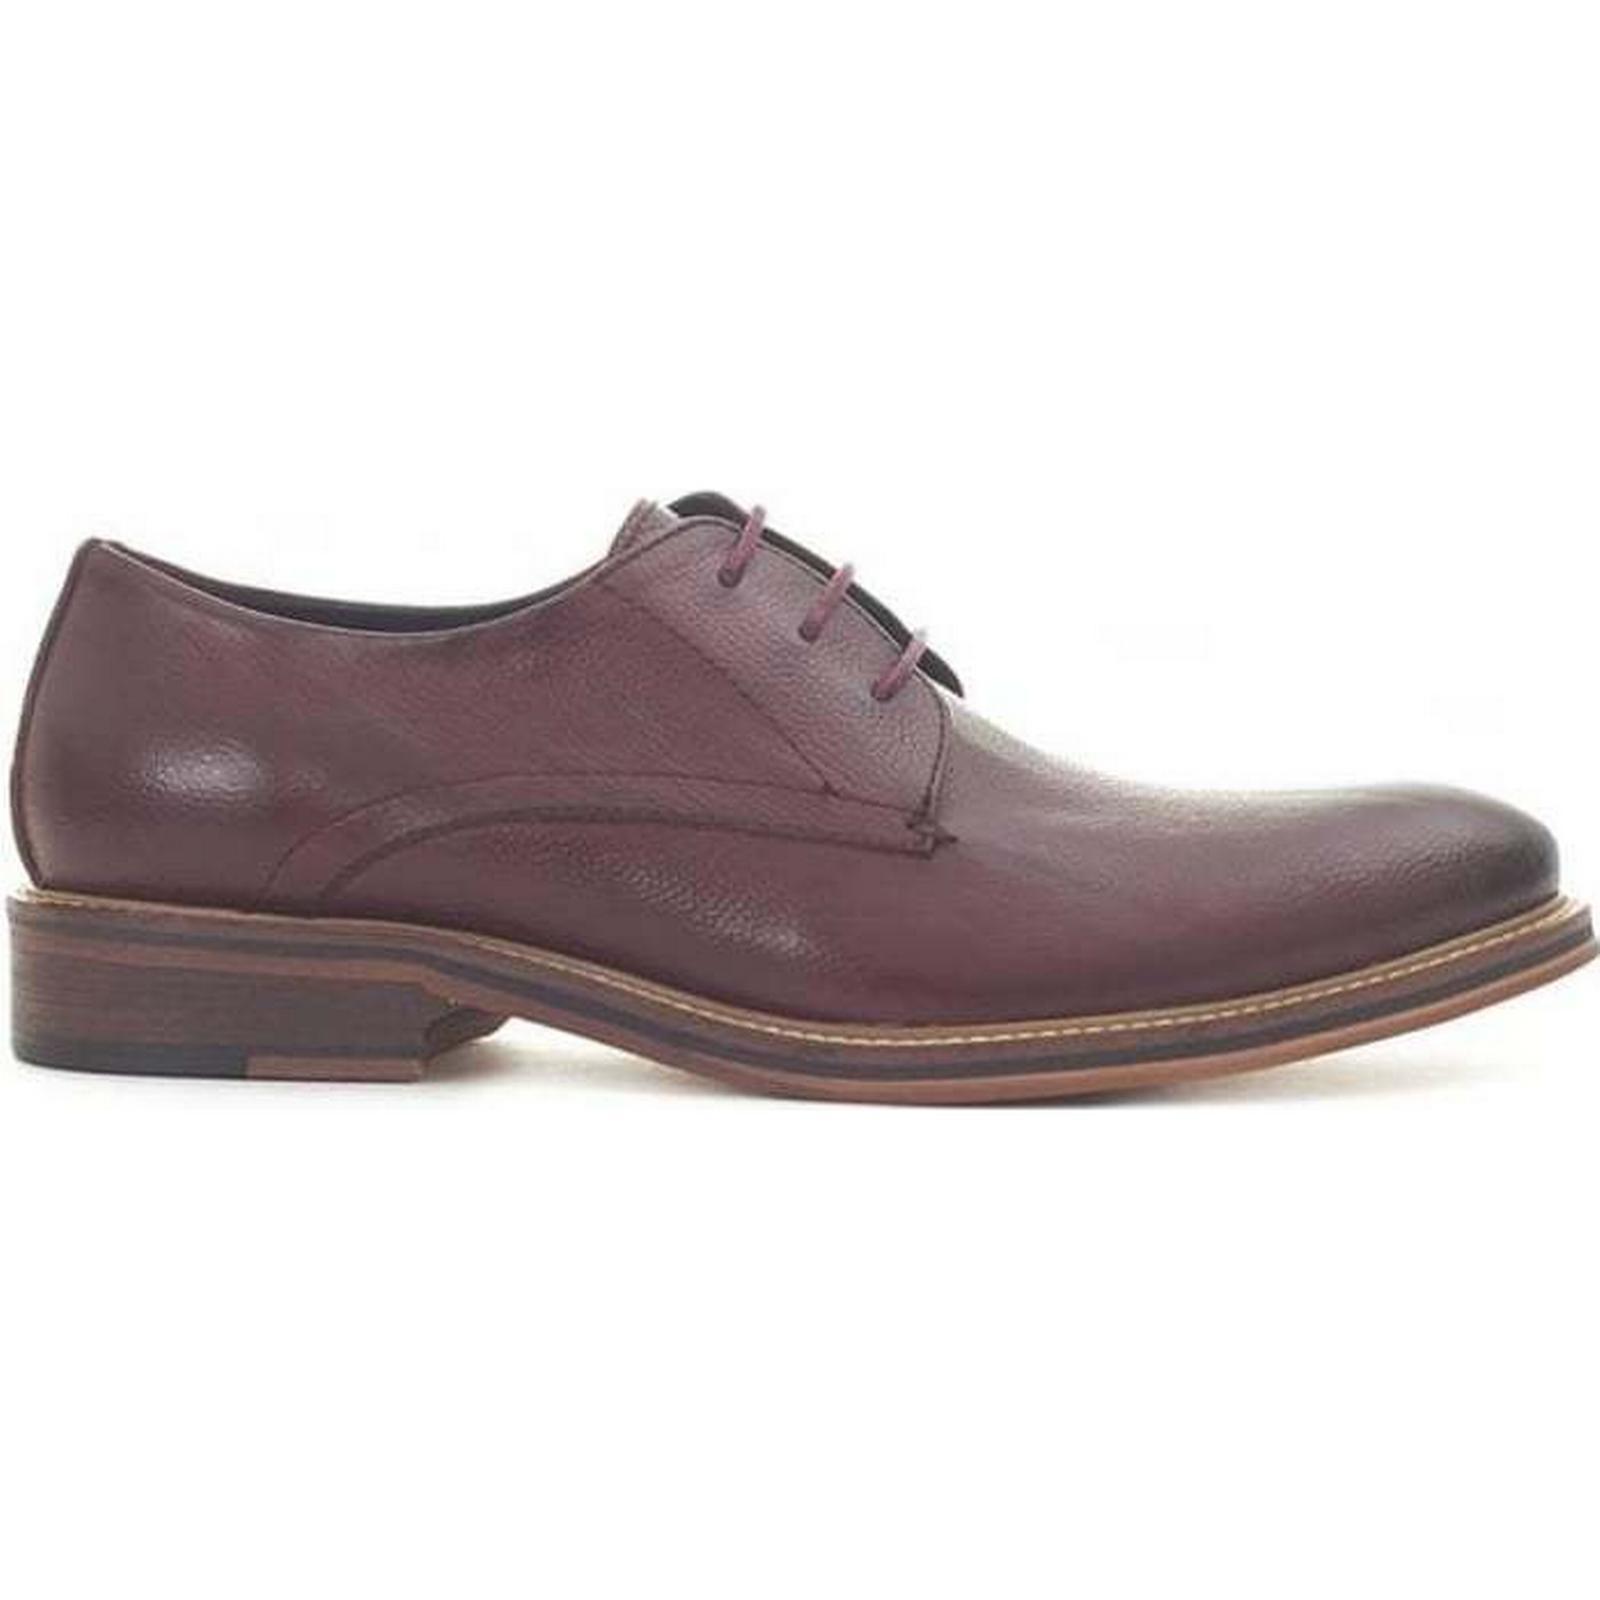 Paolo Vandini Grained Derby Size: Shoes Colour: BURGUNDY, Size: Derby 7 8631df